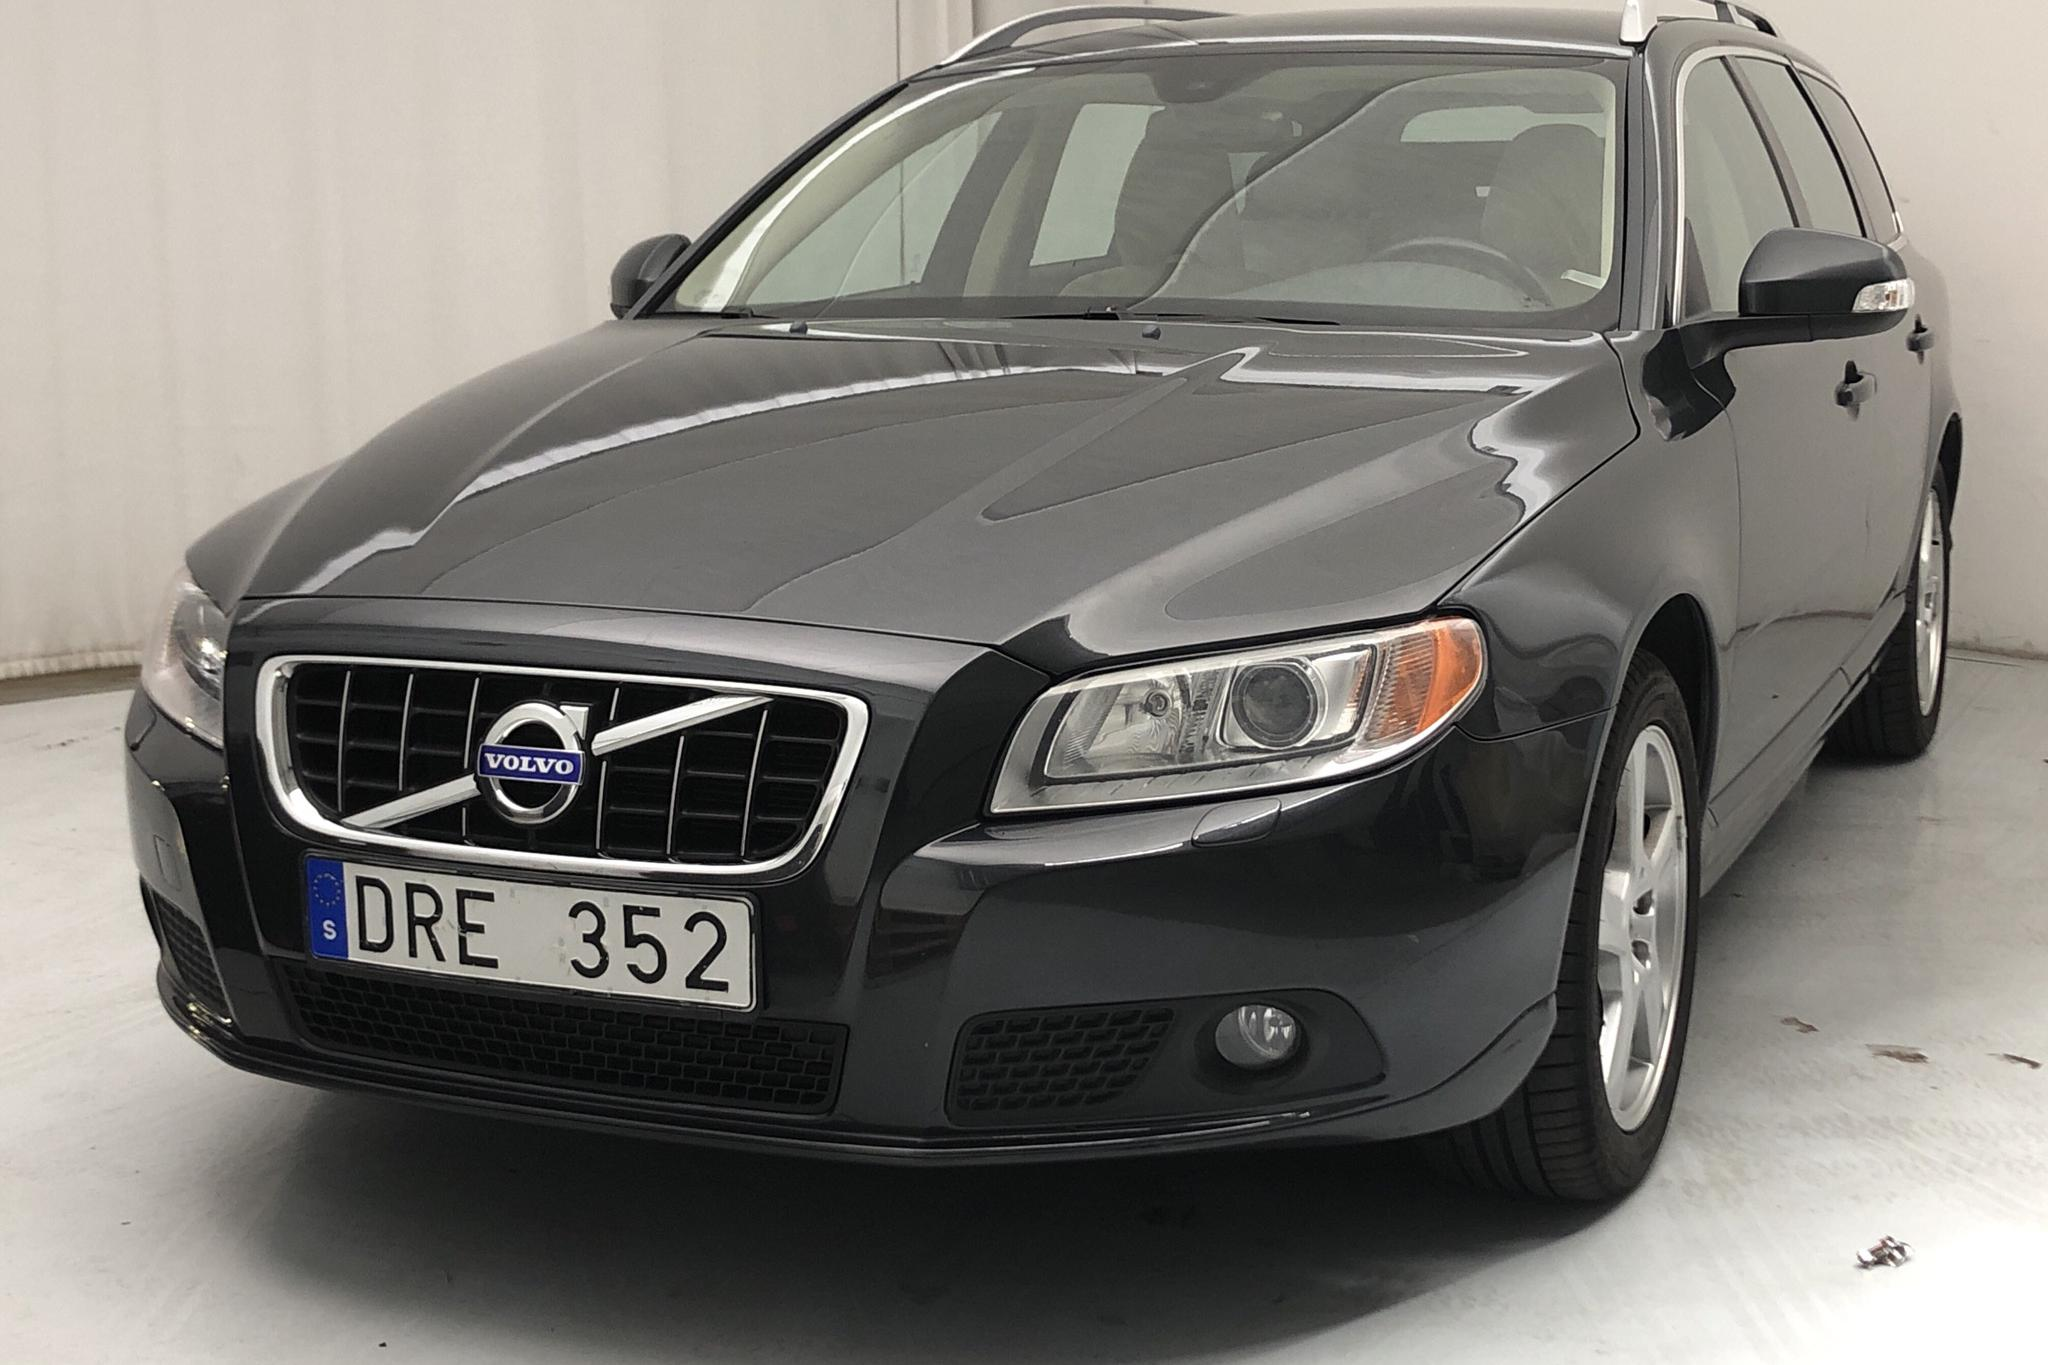 Volvo V70 II D5 AWD (205hk) - 15 960 mil - Automat - grå - 2011